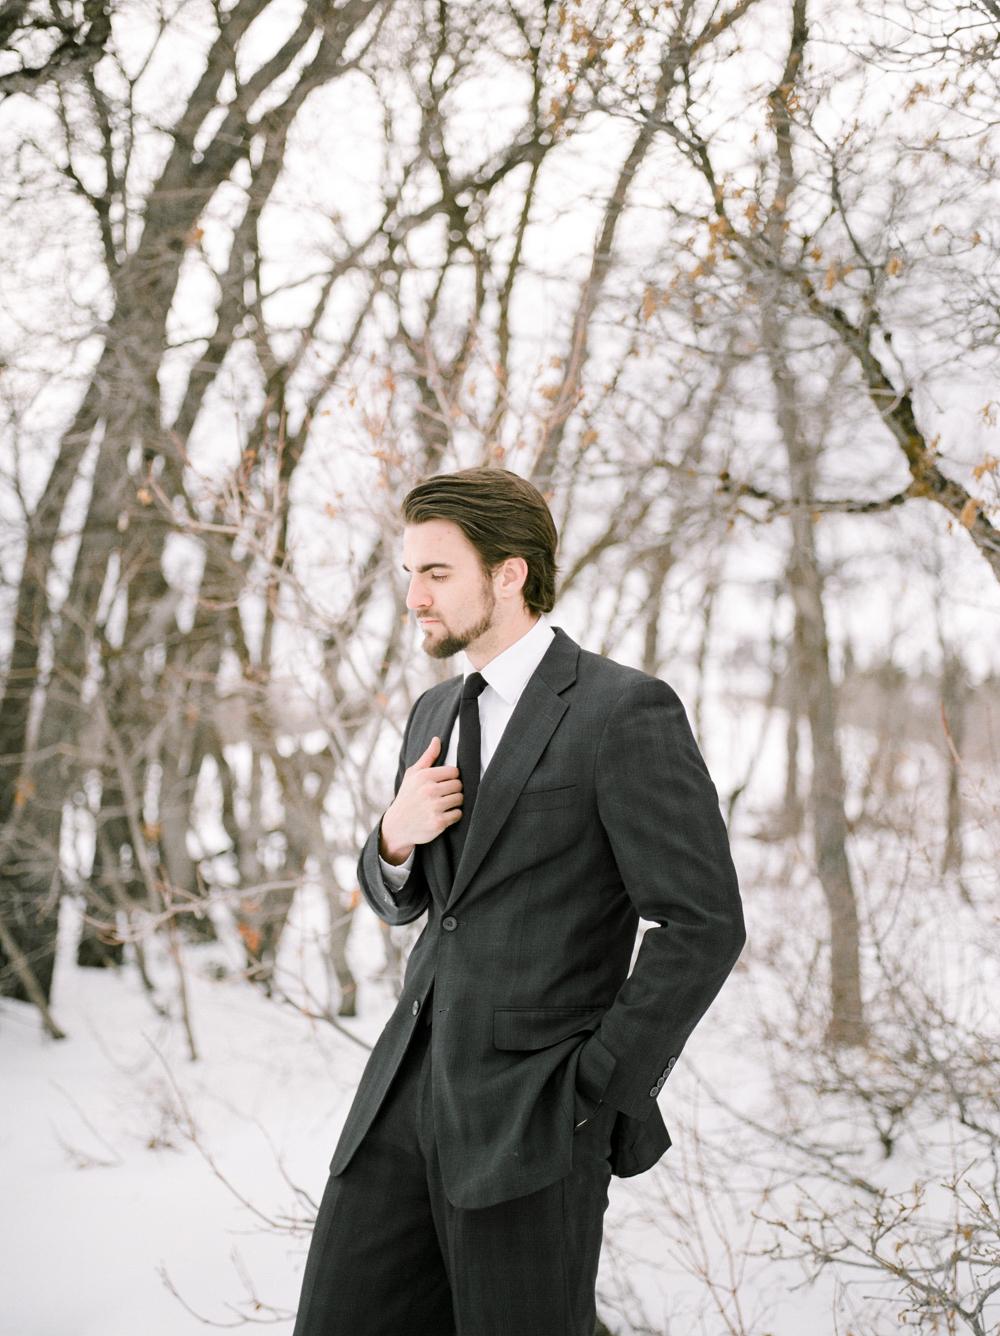 Christine-Gosch-Utah-film-photographer-wedding-mountains-snow-snowy-destination-9.jpg